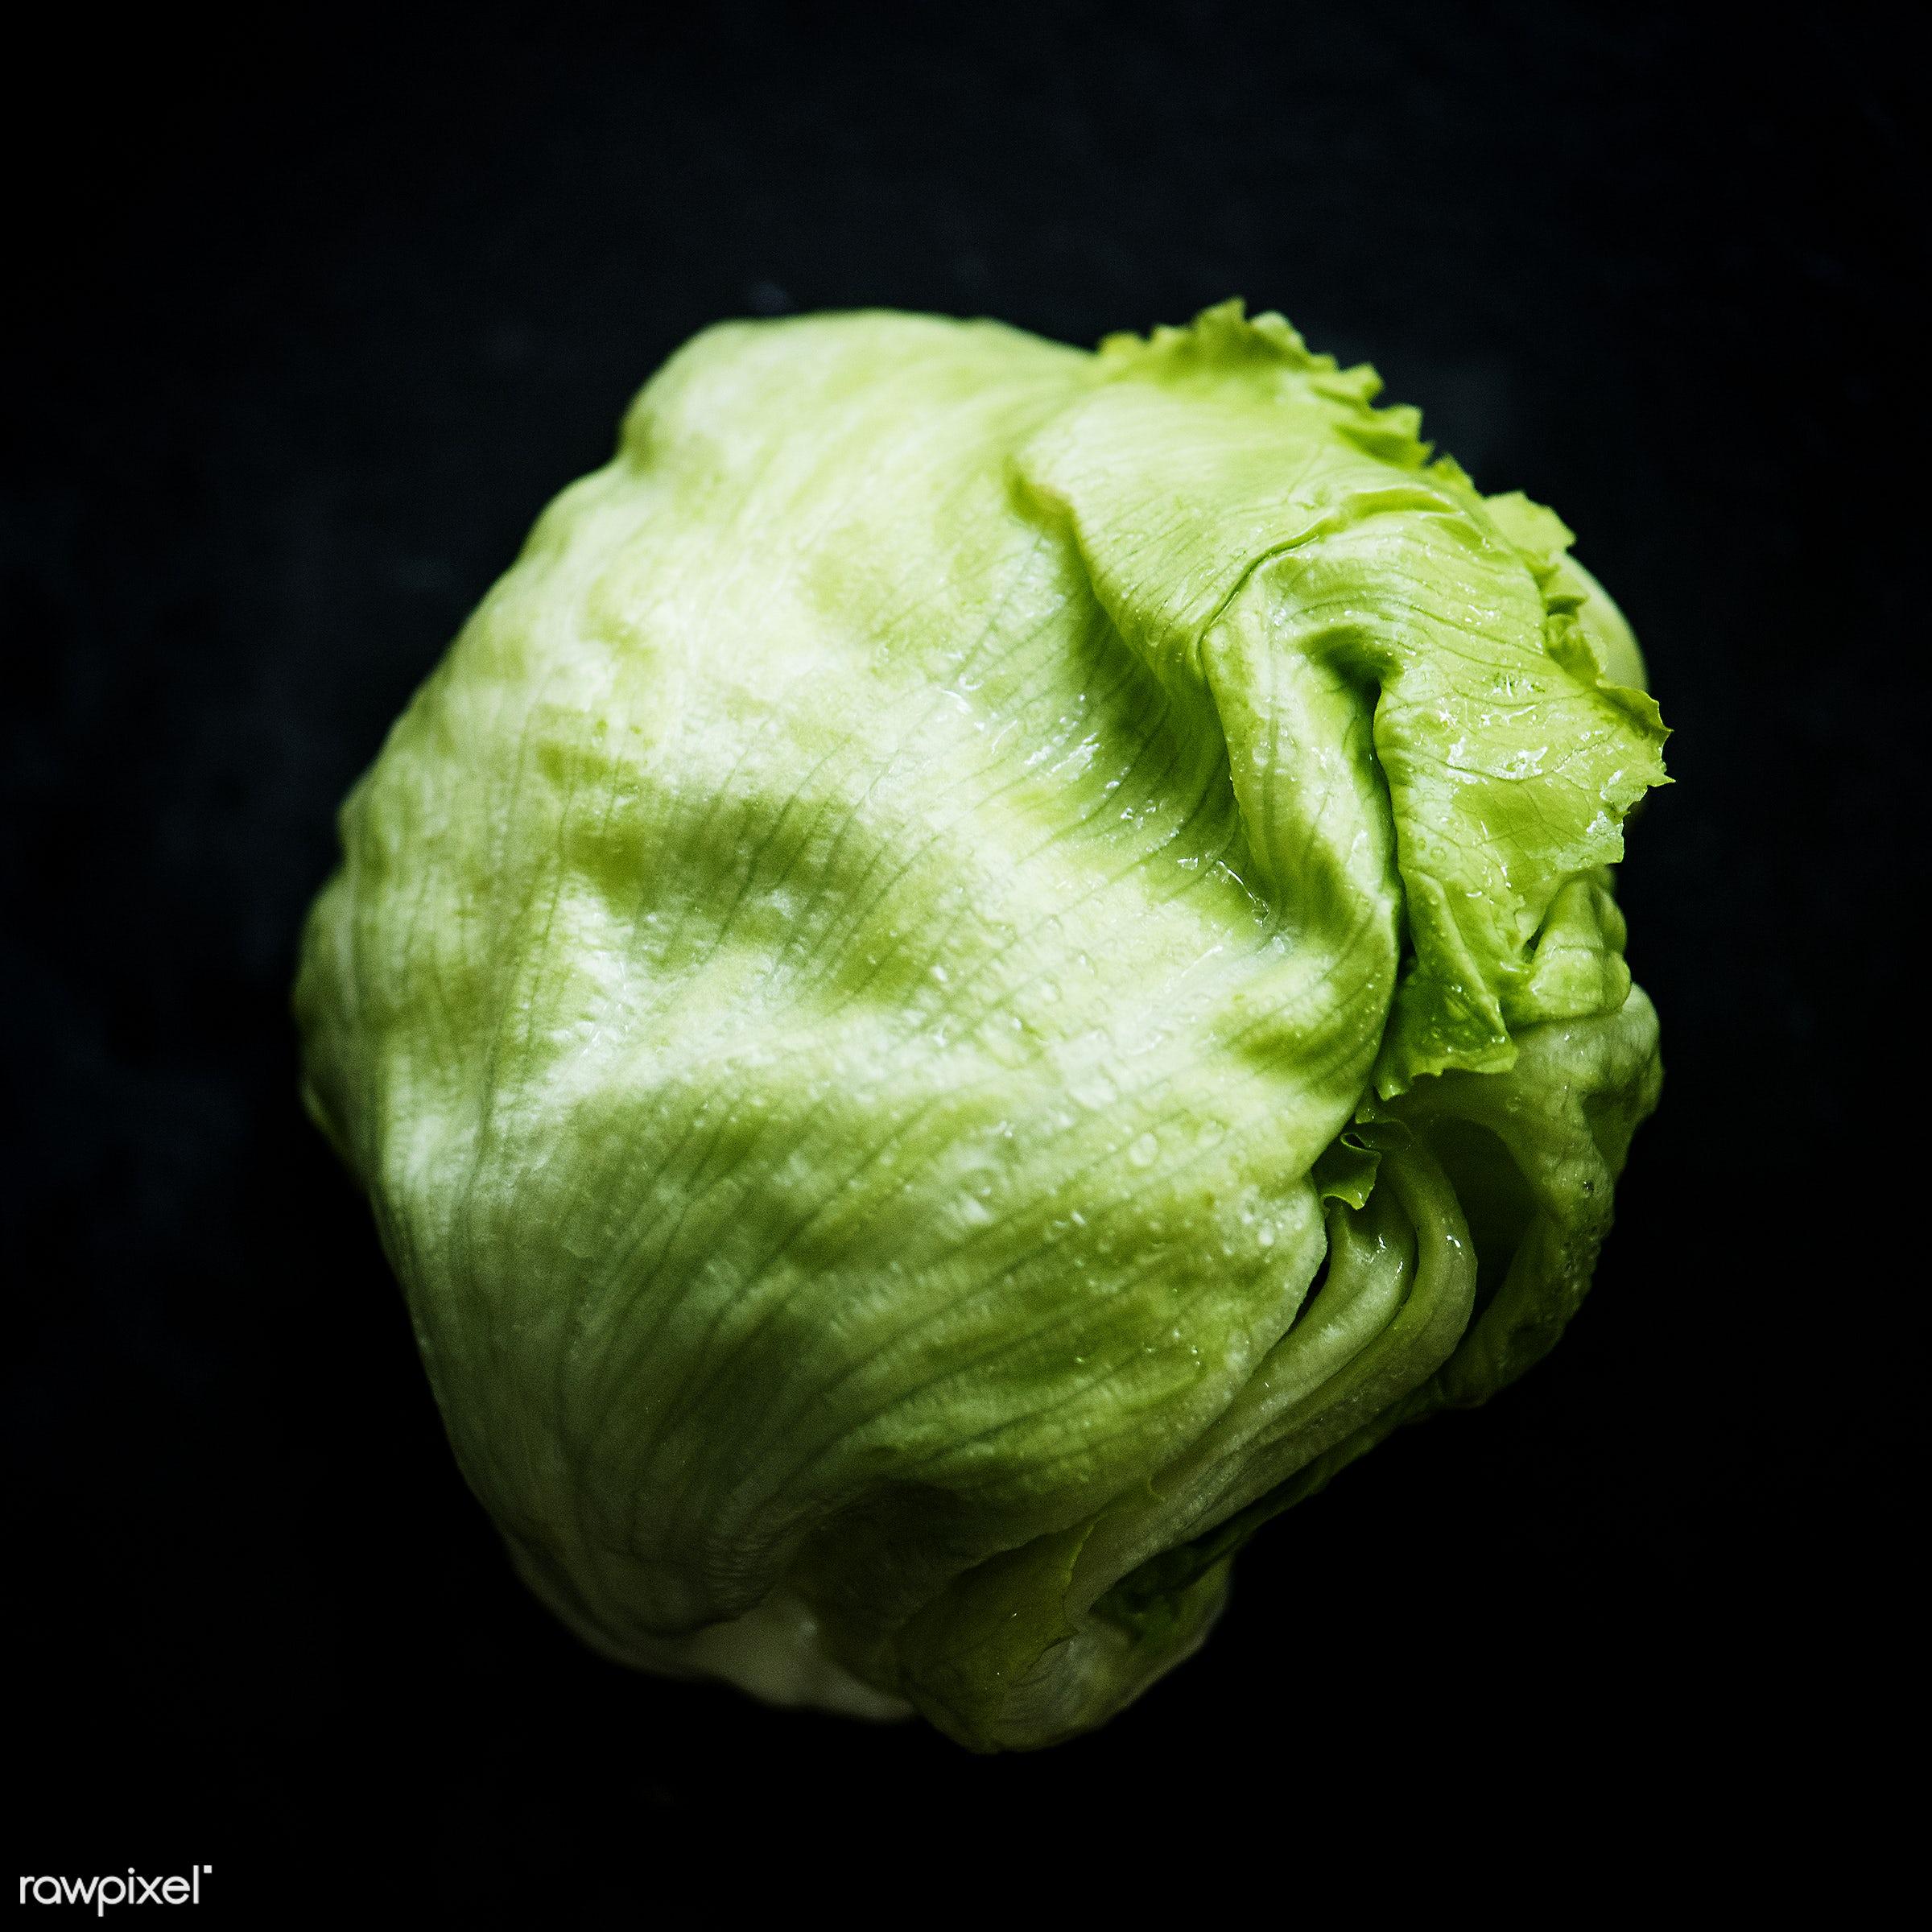 Fresh iceberg lettuce - raw, organic, nature, cabbage, fresh, background, healthy, harvest, vegetable, closeup, iceberg